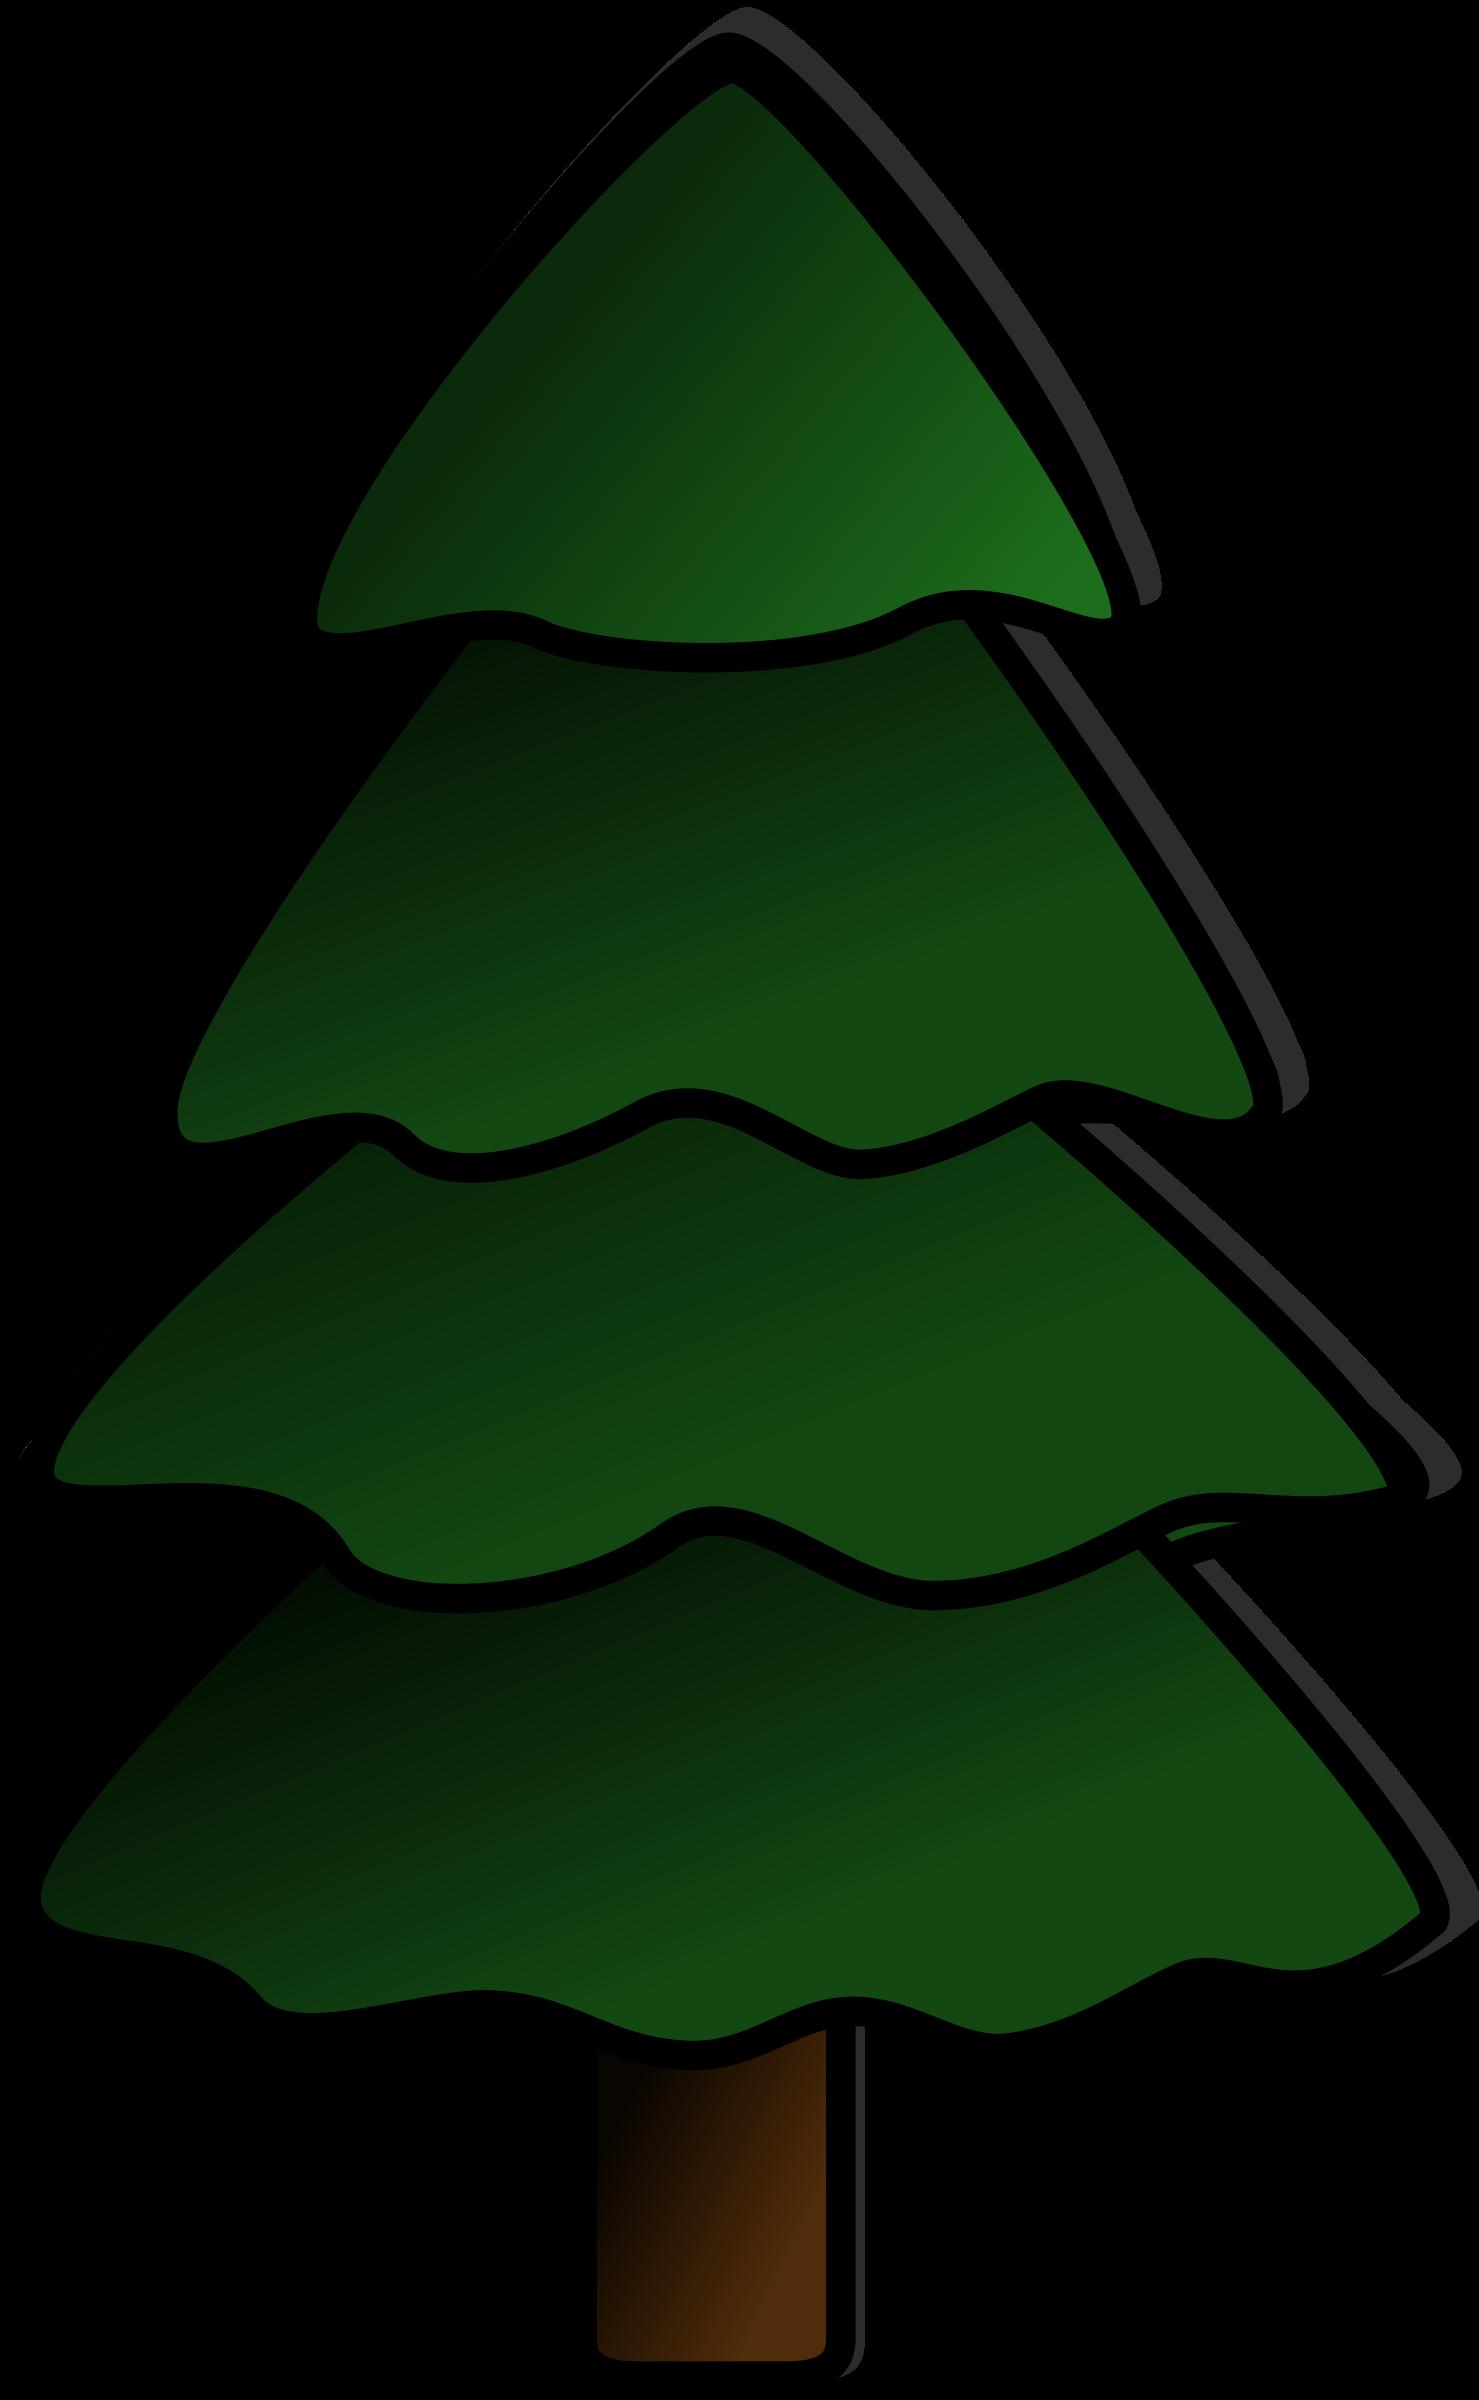 ... Pine Tree Clipart - clipartall ...